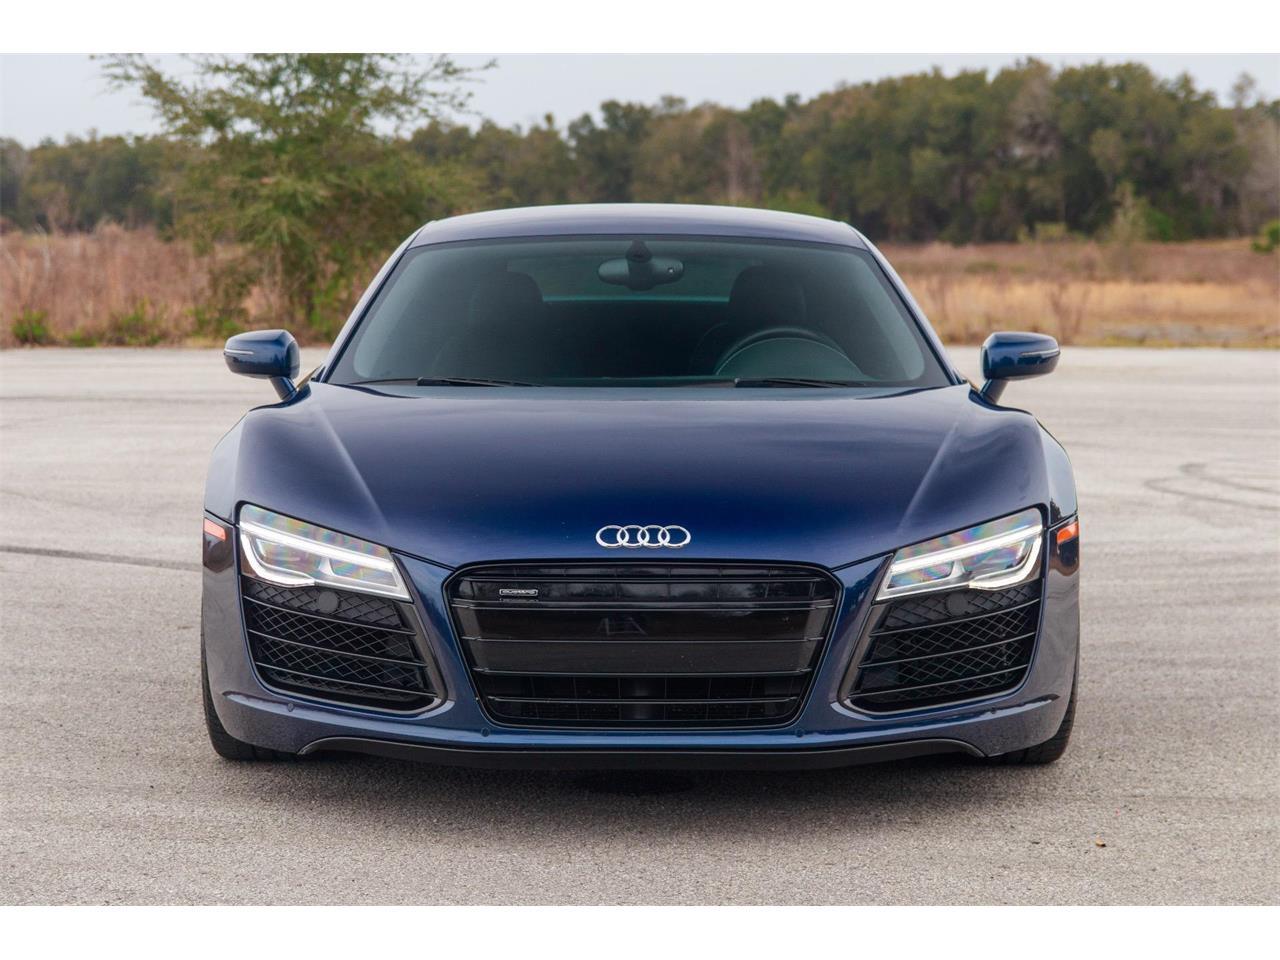 2014 Audi R8 (CC-1320472) for sale in Ocala, Florida